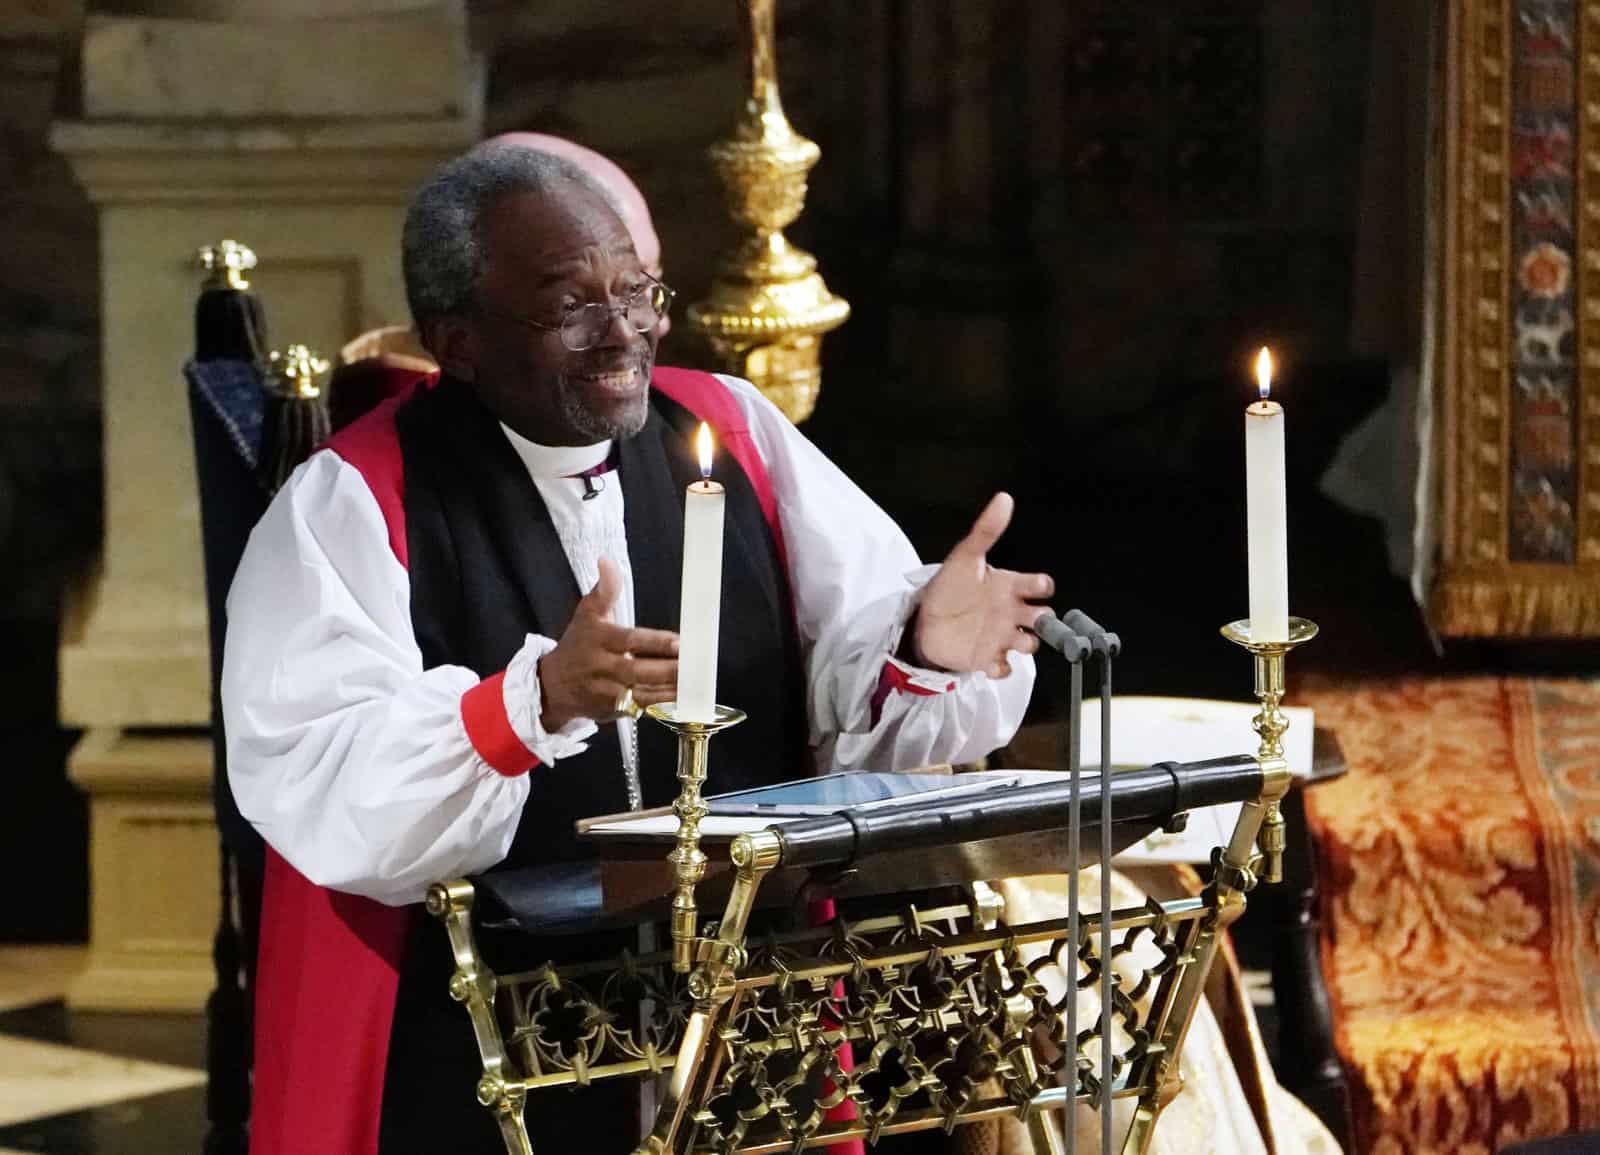 A royal wedding is a traditional affair, but an iPad still made an appearance.